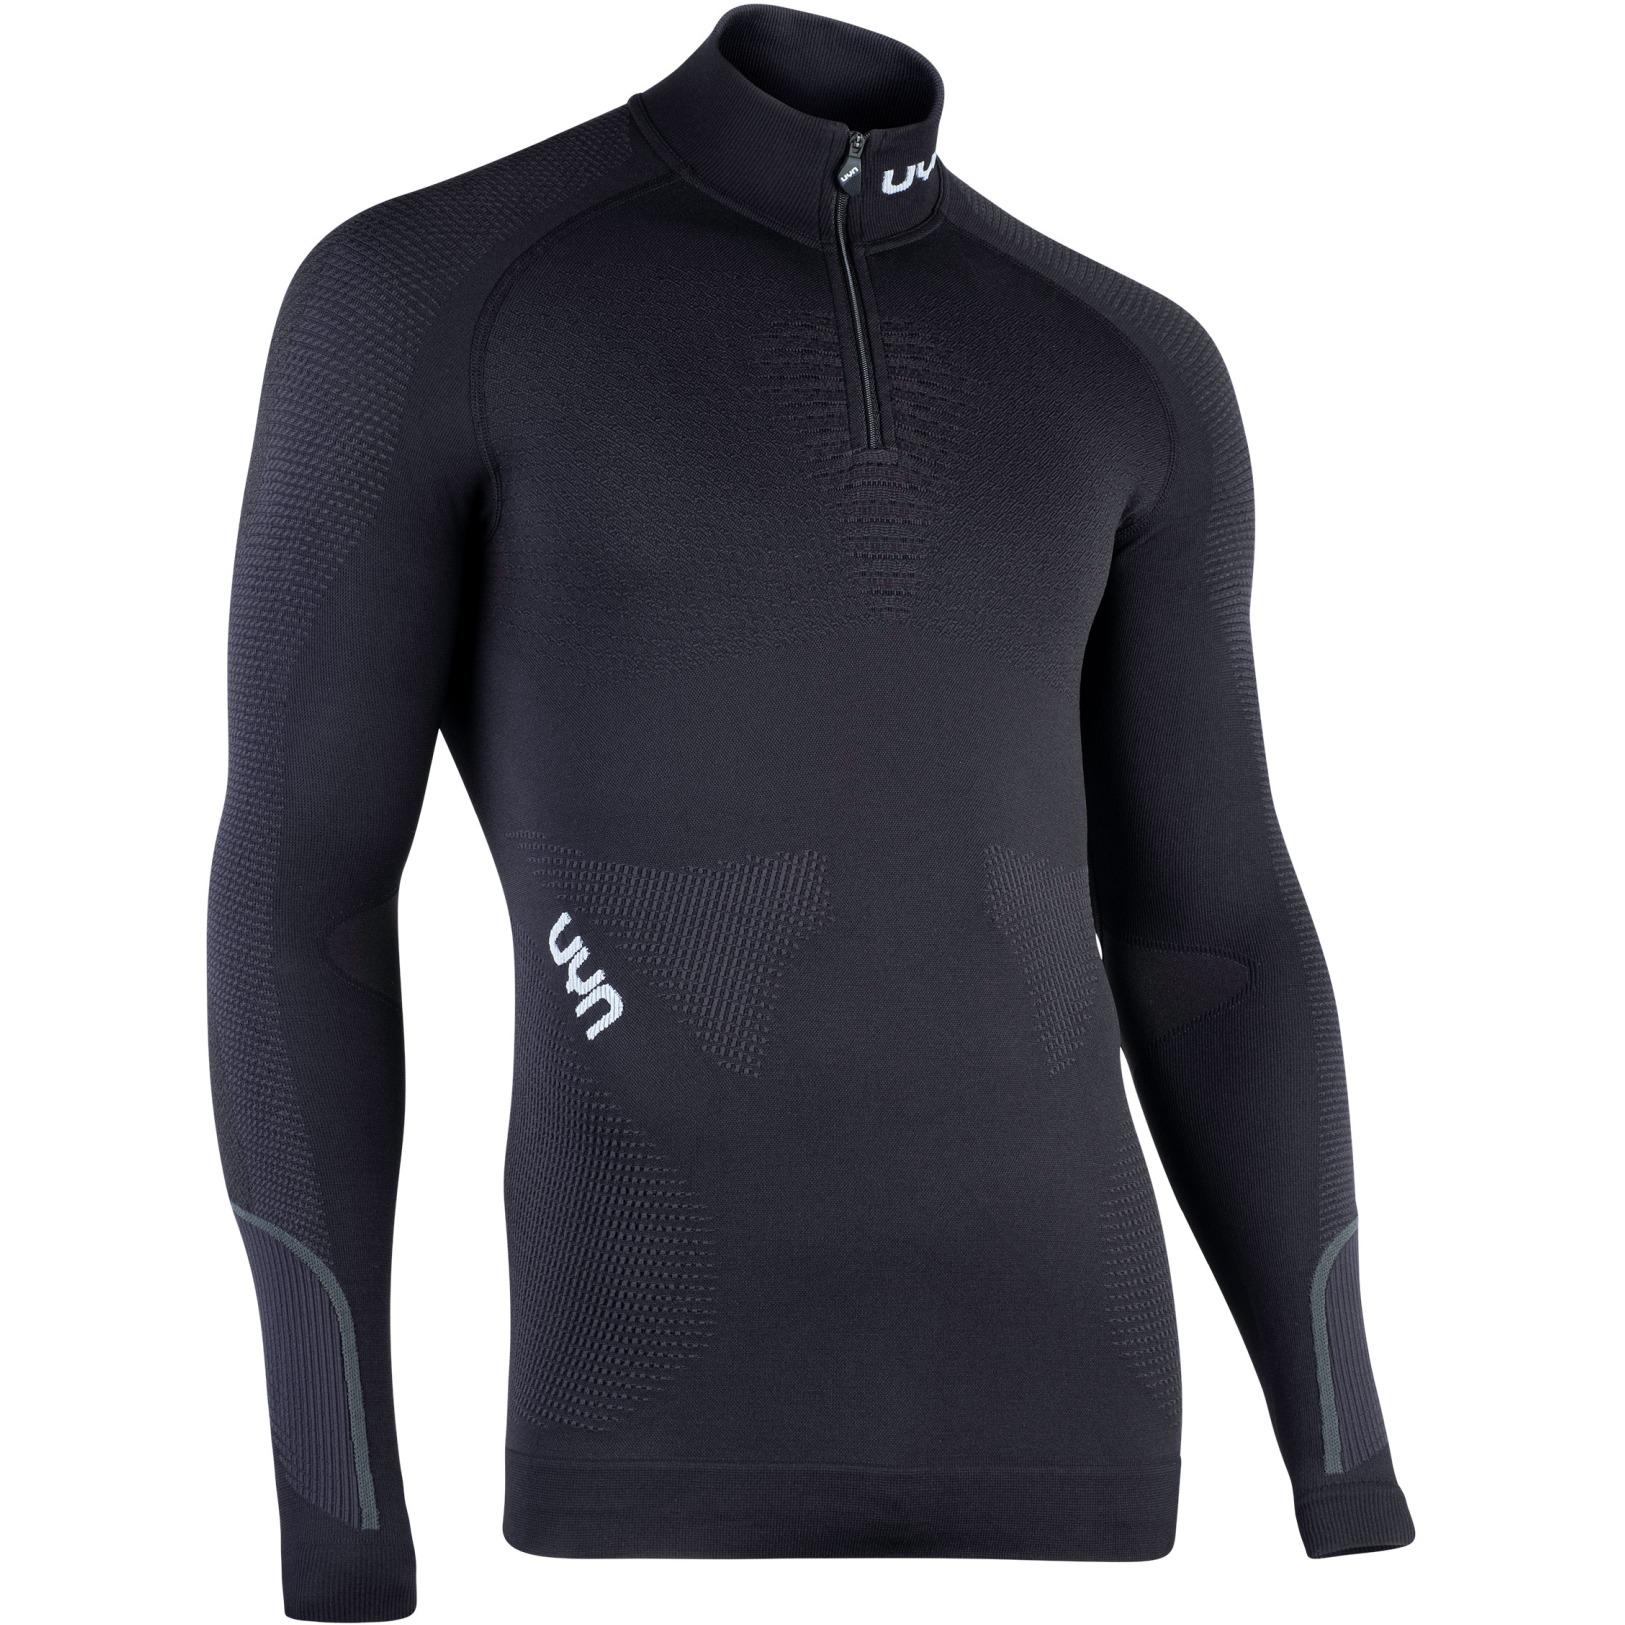 UYN Ambityon Underwear Turtle Neck Shirt - Blackboard/Black/White